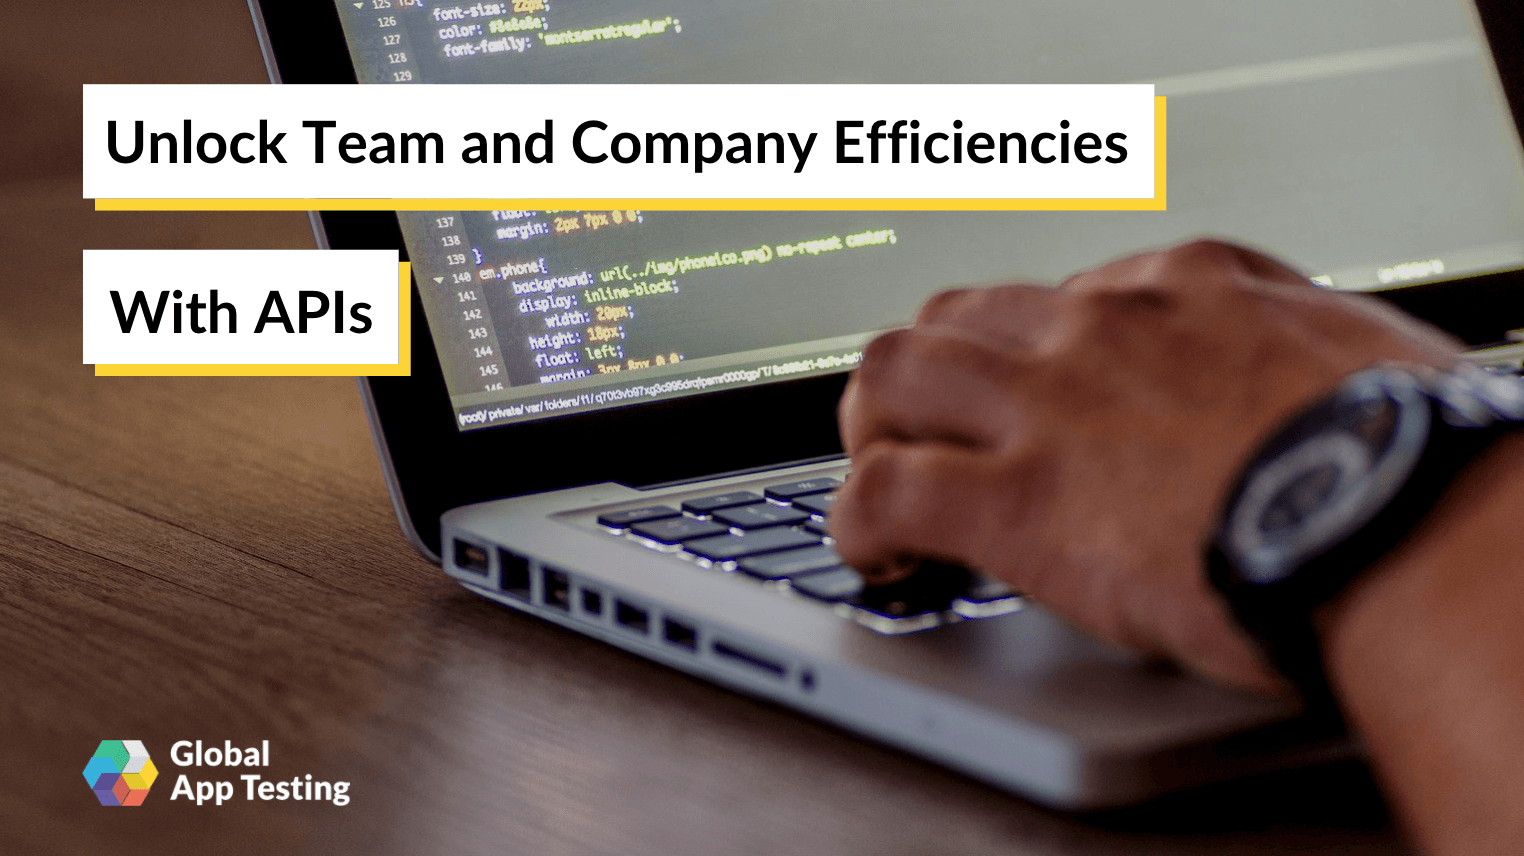 Unlock Team and Company Efficiencies with APIs